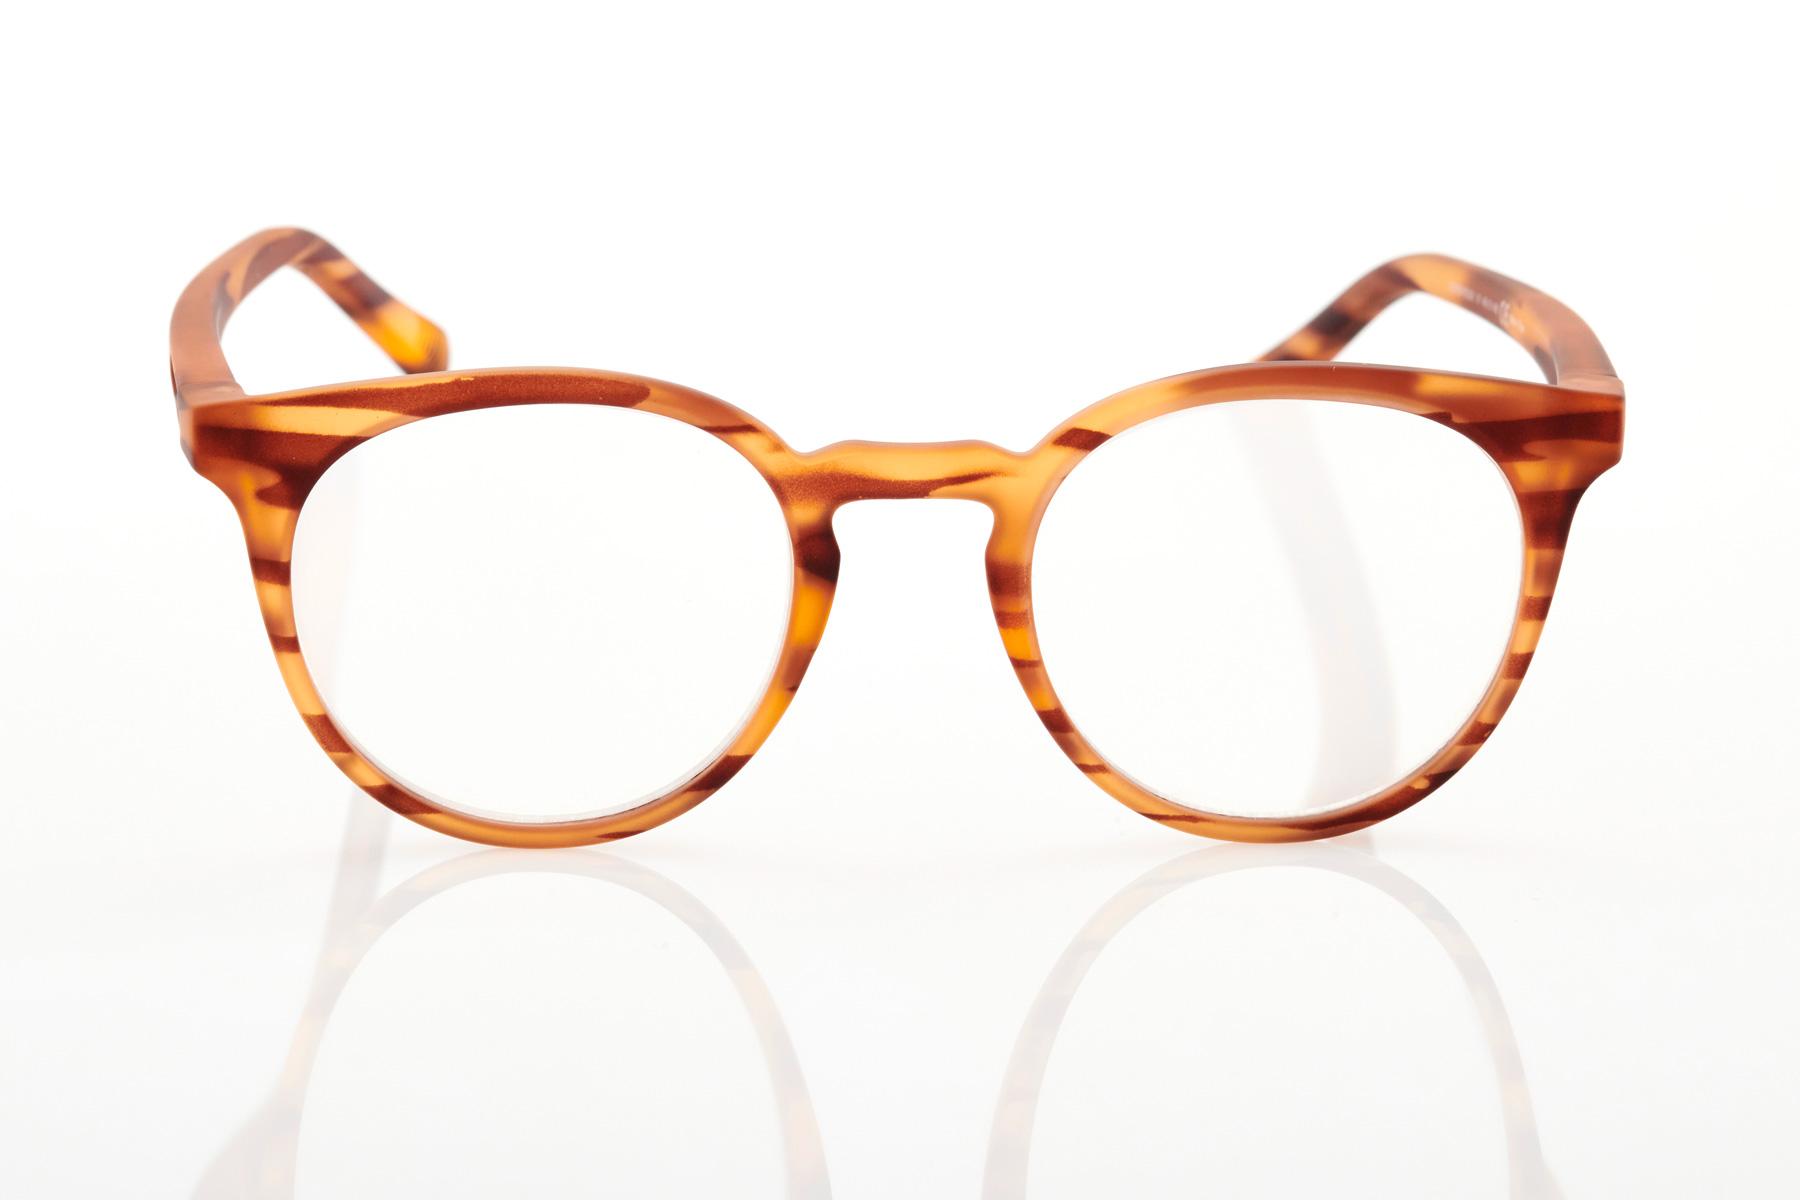 Hawkers ταρταρούγα γυαλιά κοντινά πρεσβυωπίας